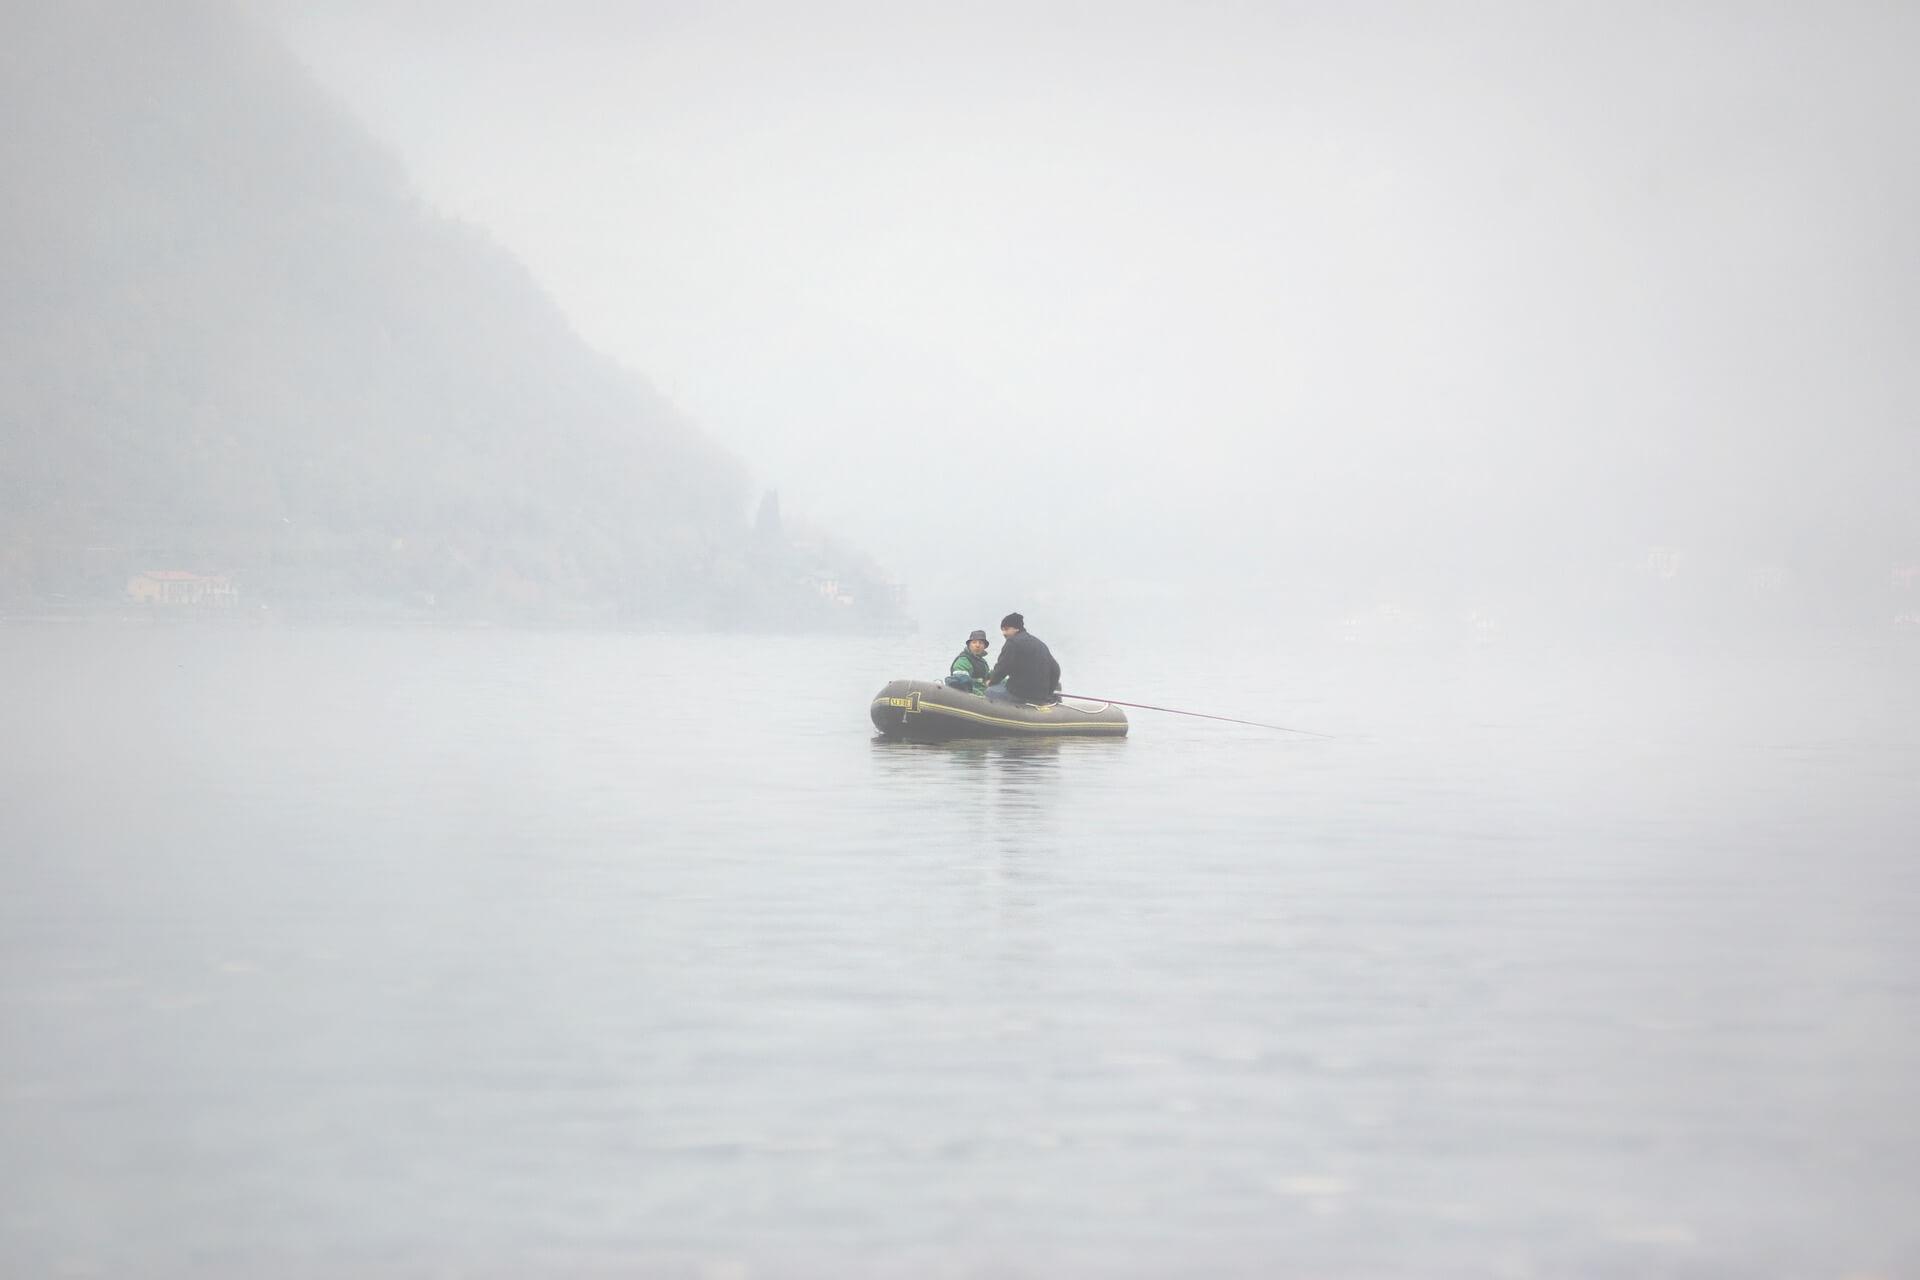 inflatable fishing dinghy lake